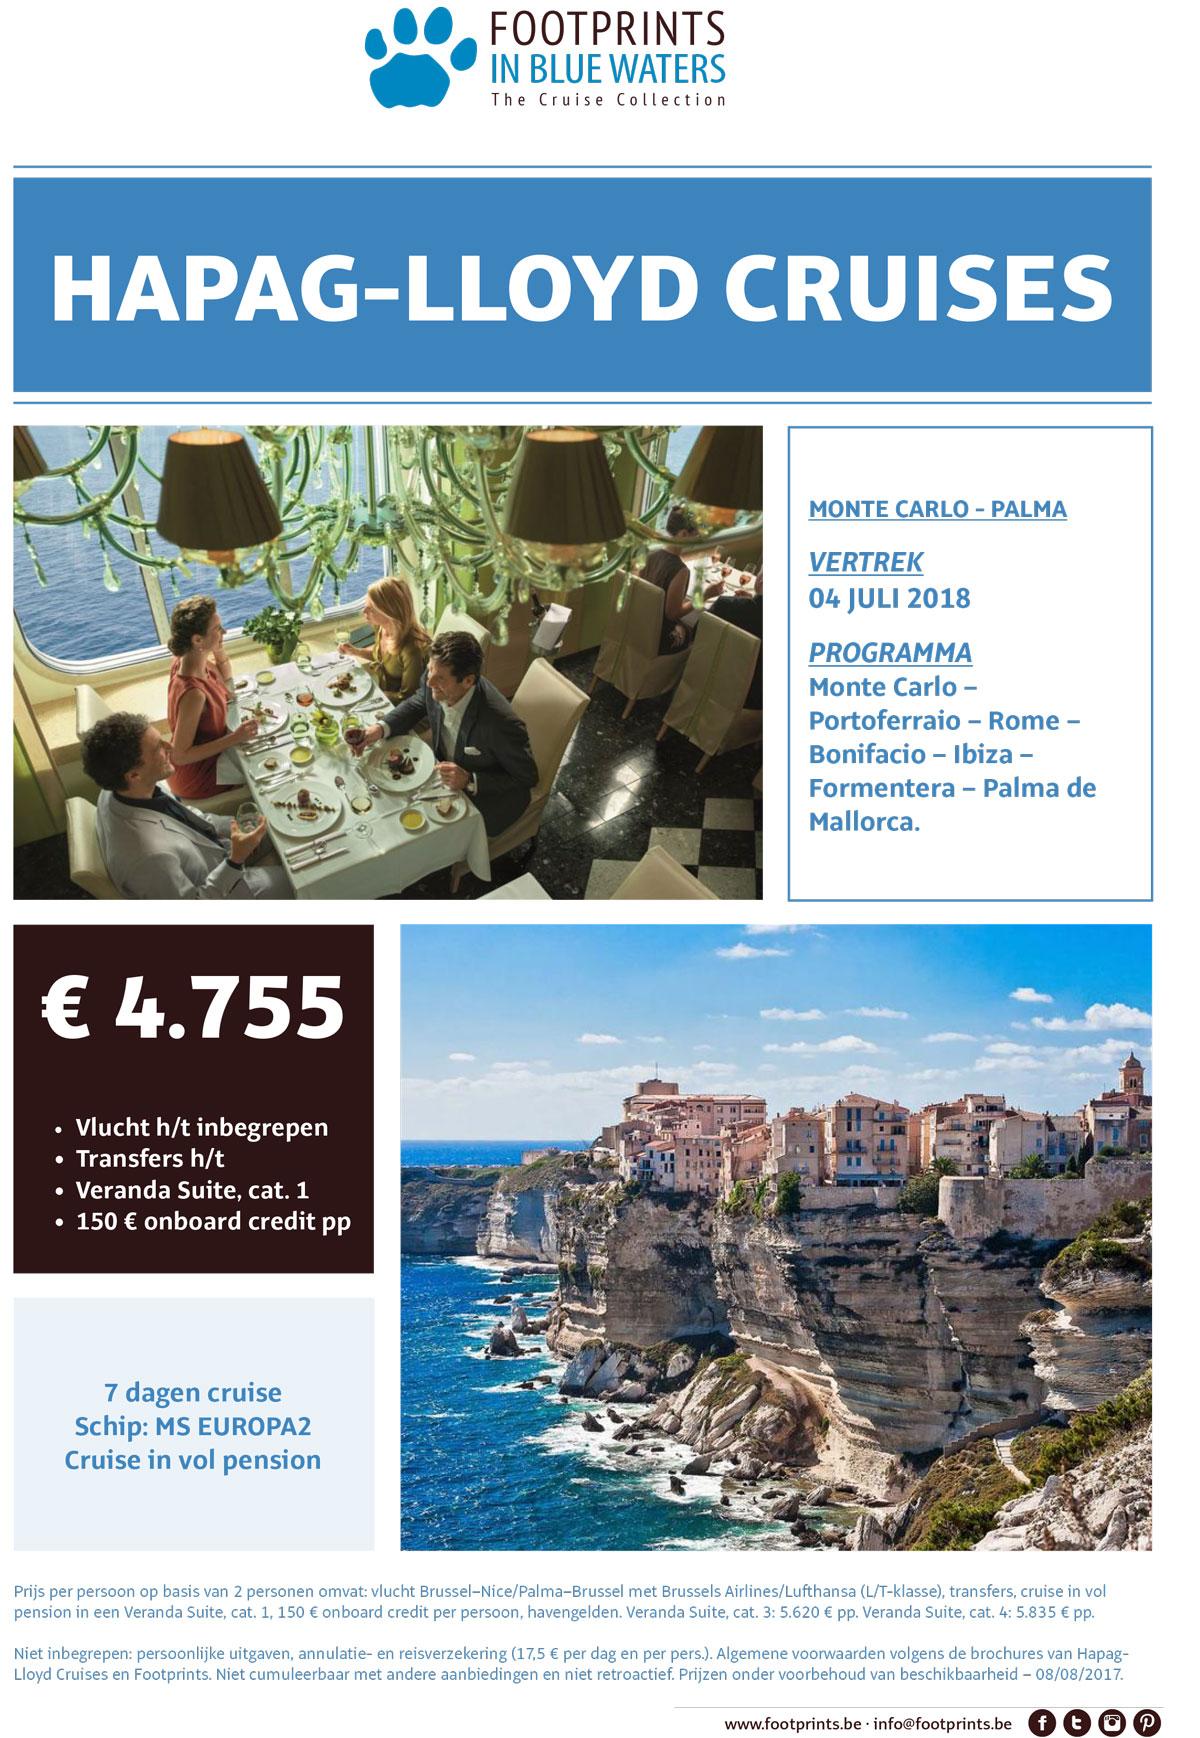 Cruise: Monte Carlo - Palma